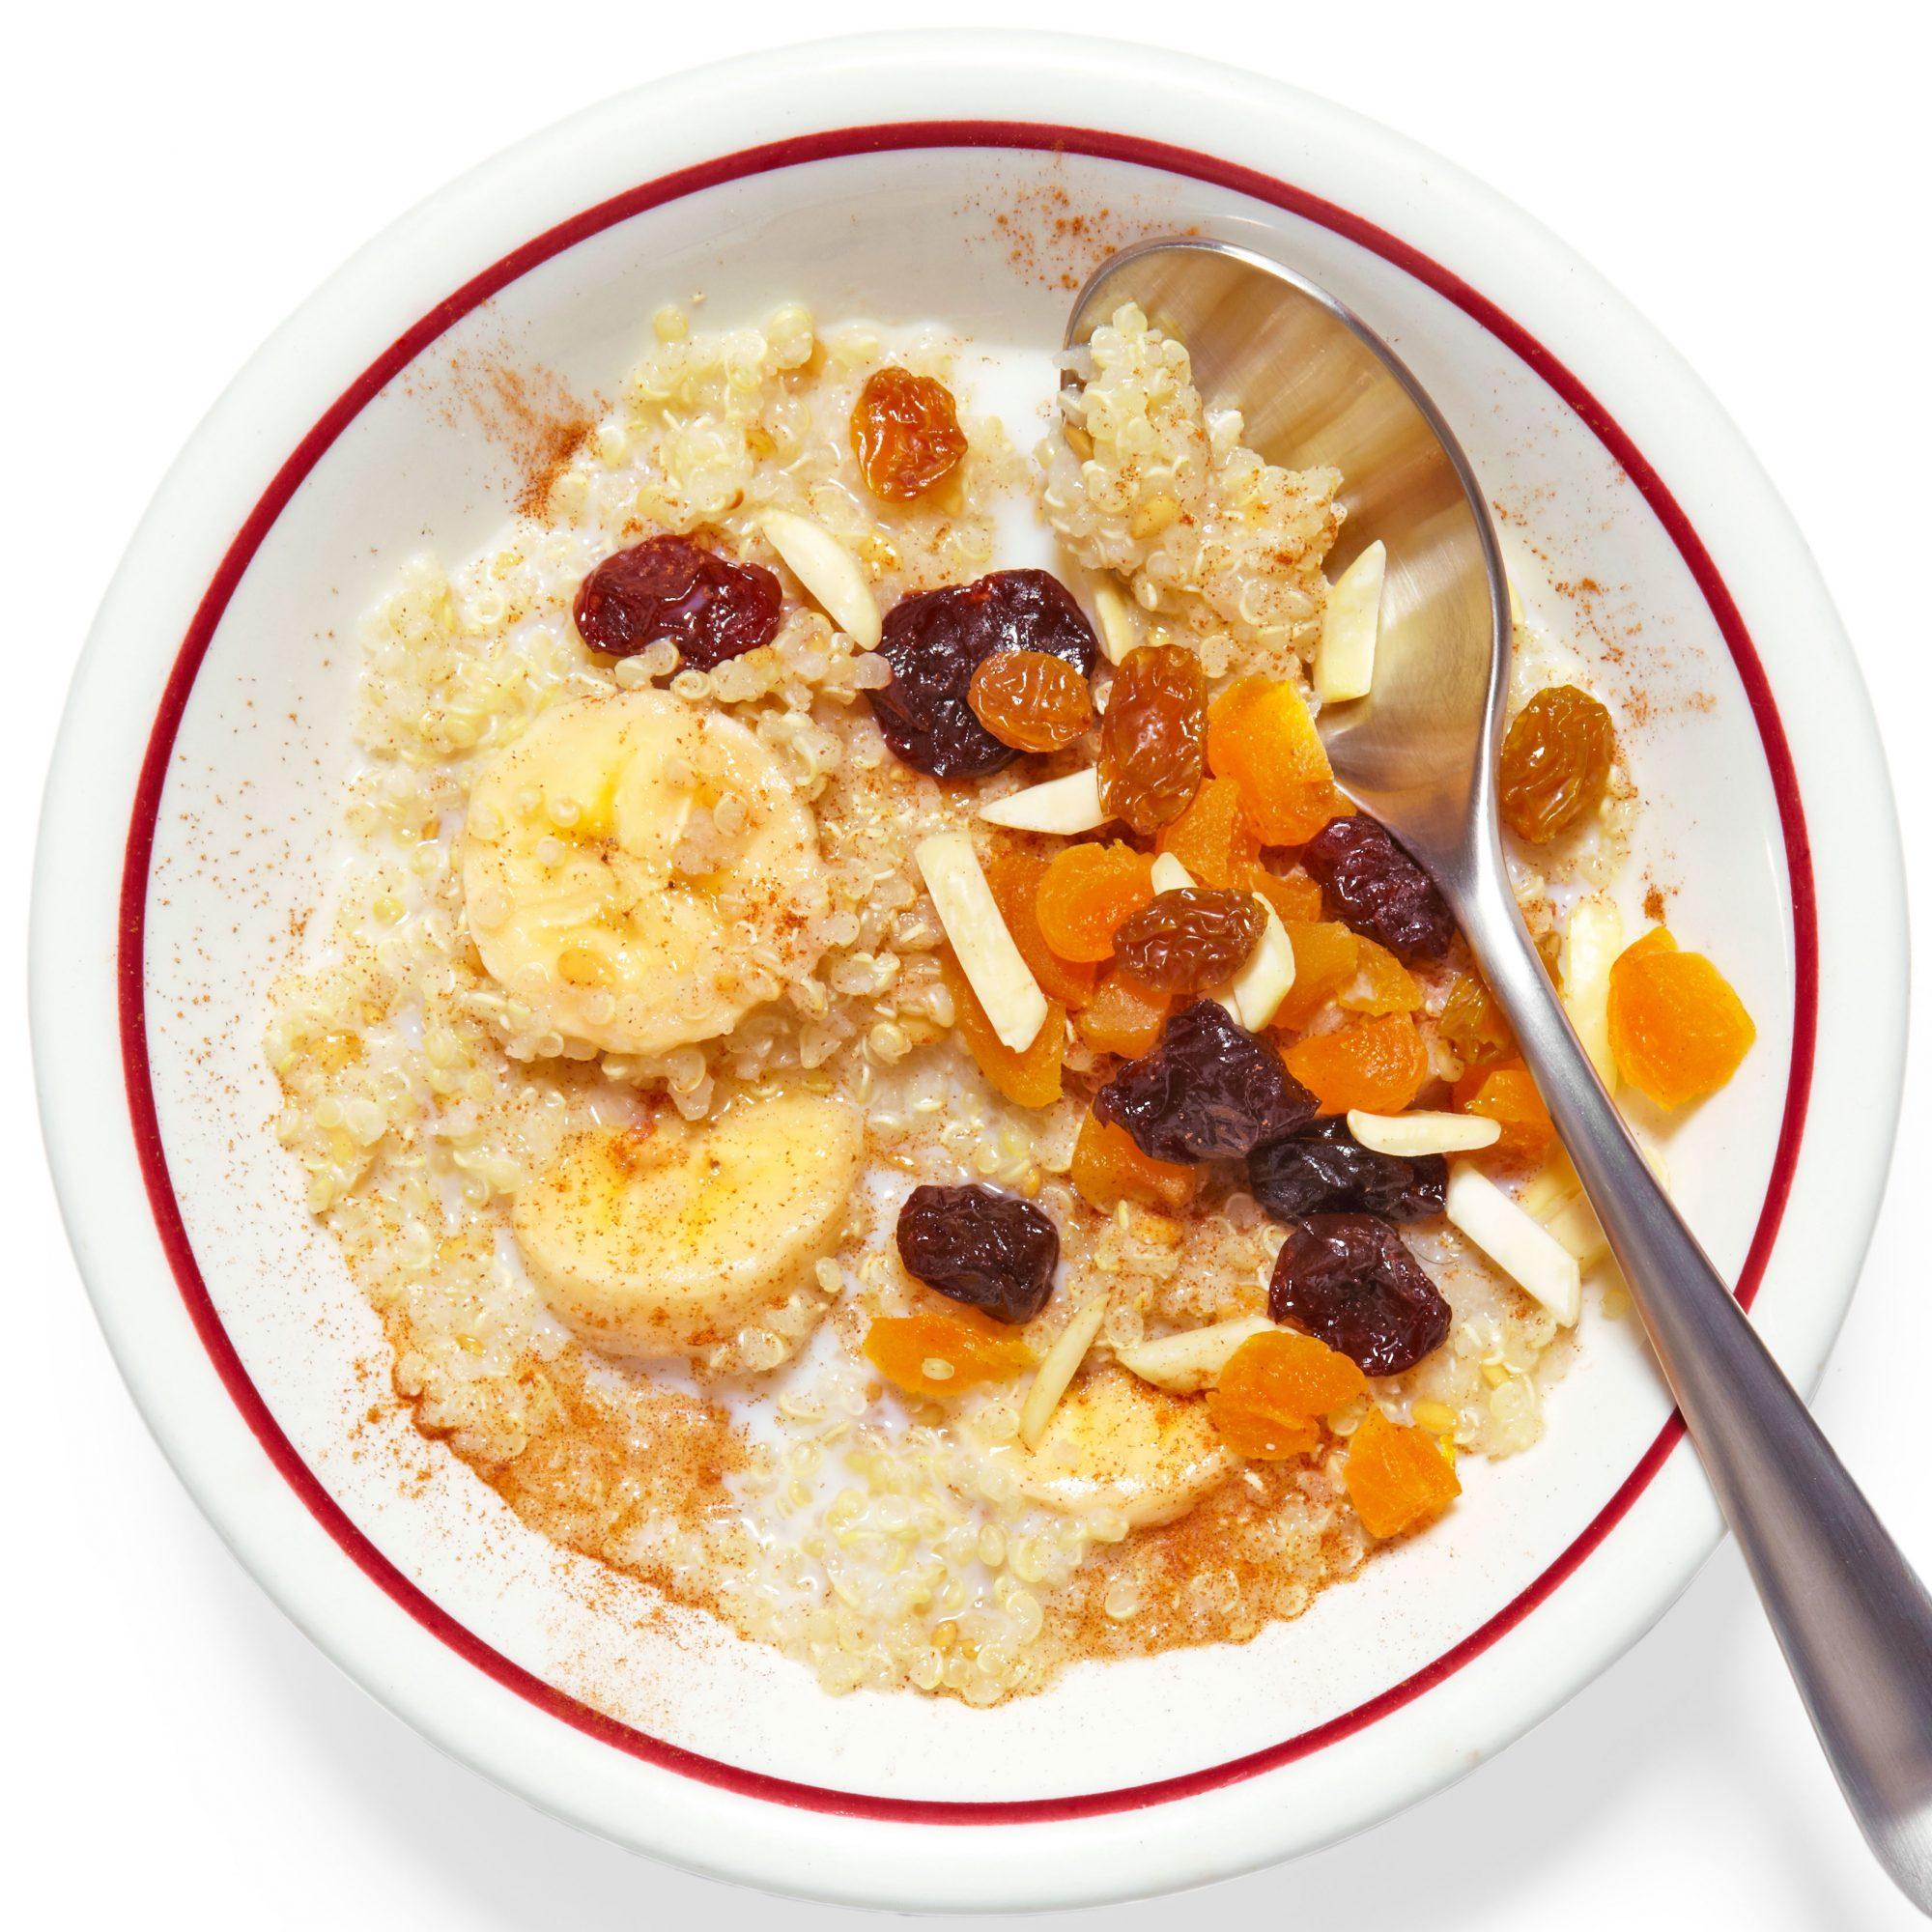 Overnight Fruit & Flax Quinoa Hot Cereal